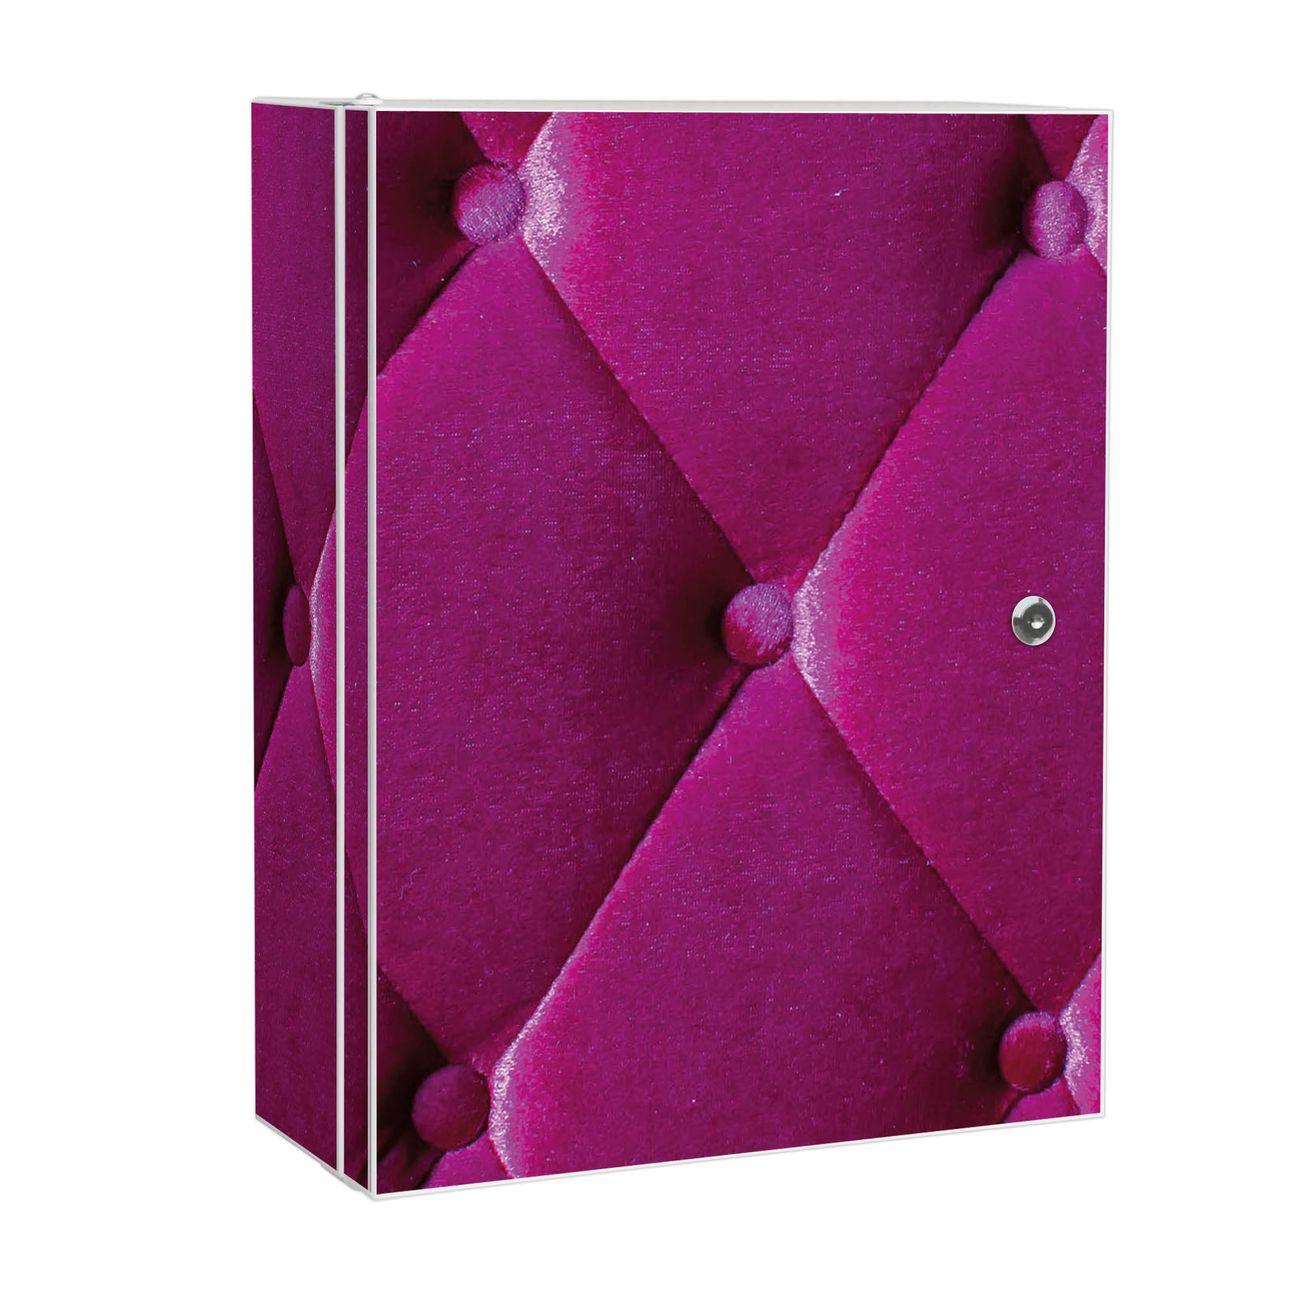 Medizinschrank Stahl Motiv Pink Polster